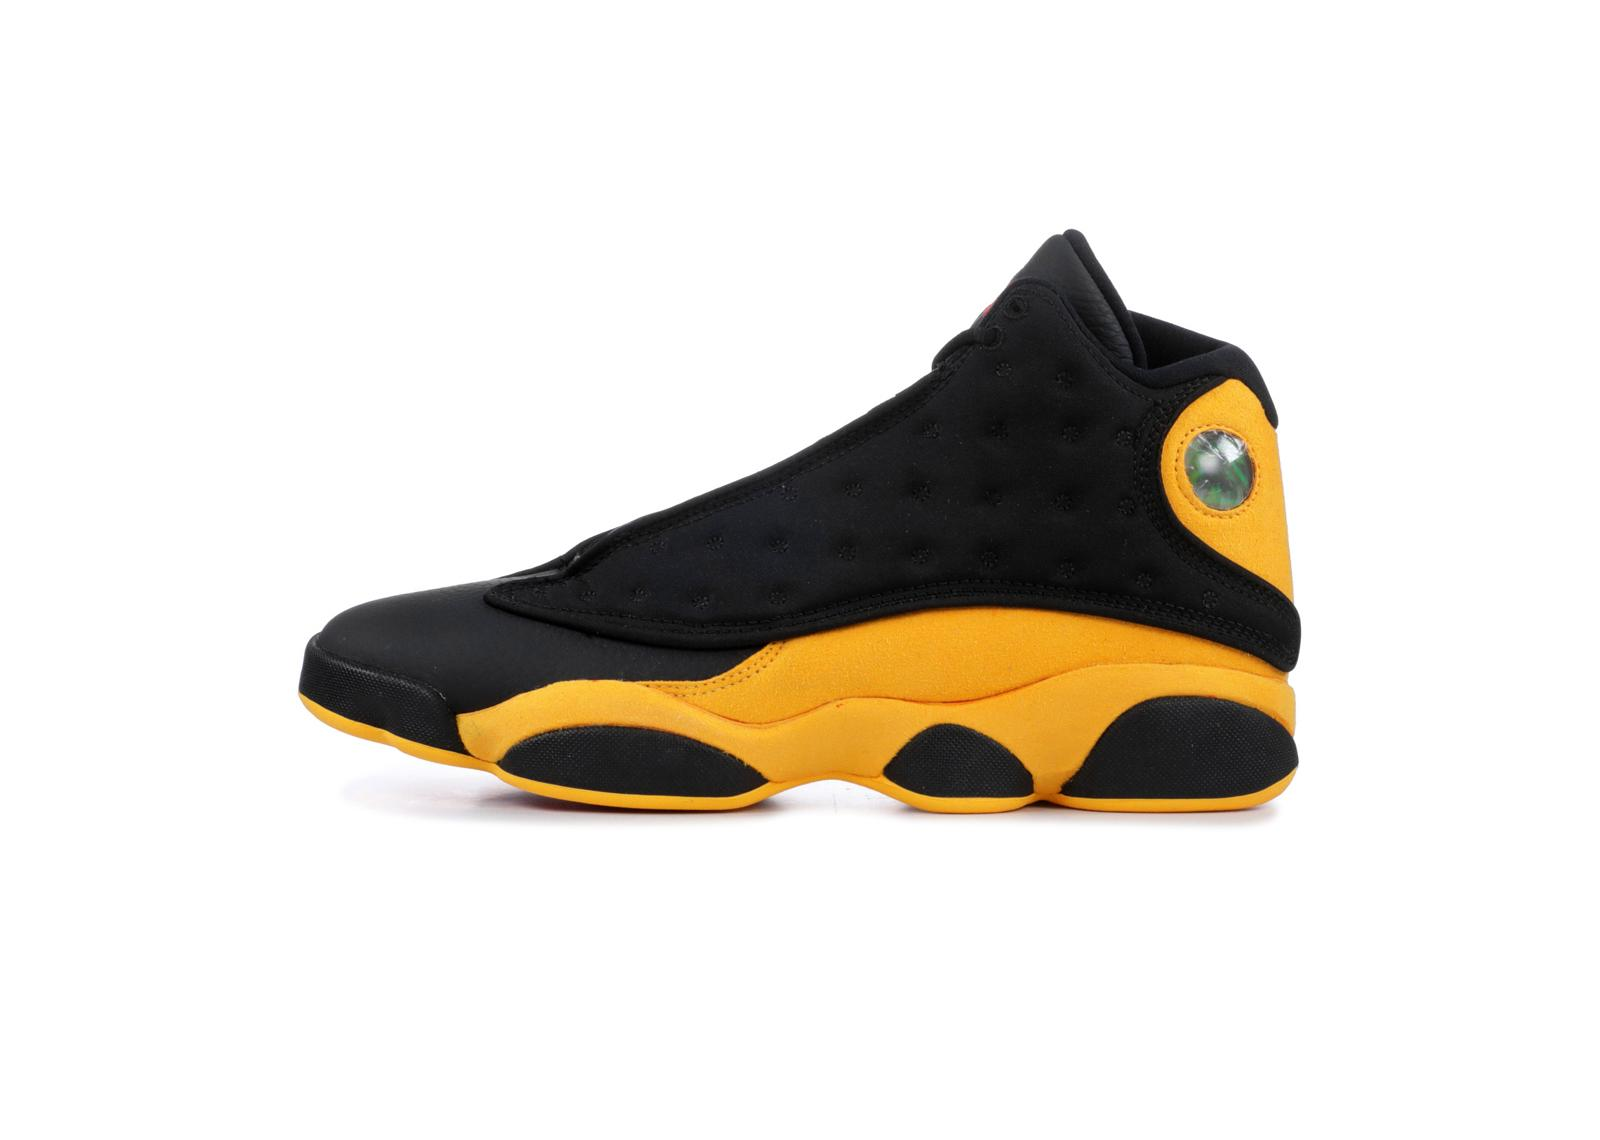 Basketbalové topánky Nike Air jordan 13 Retro